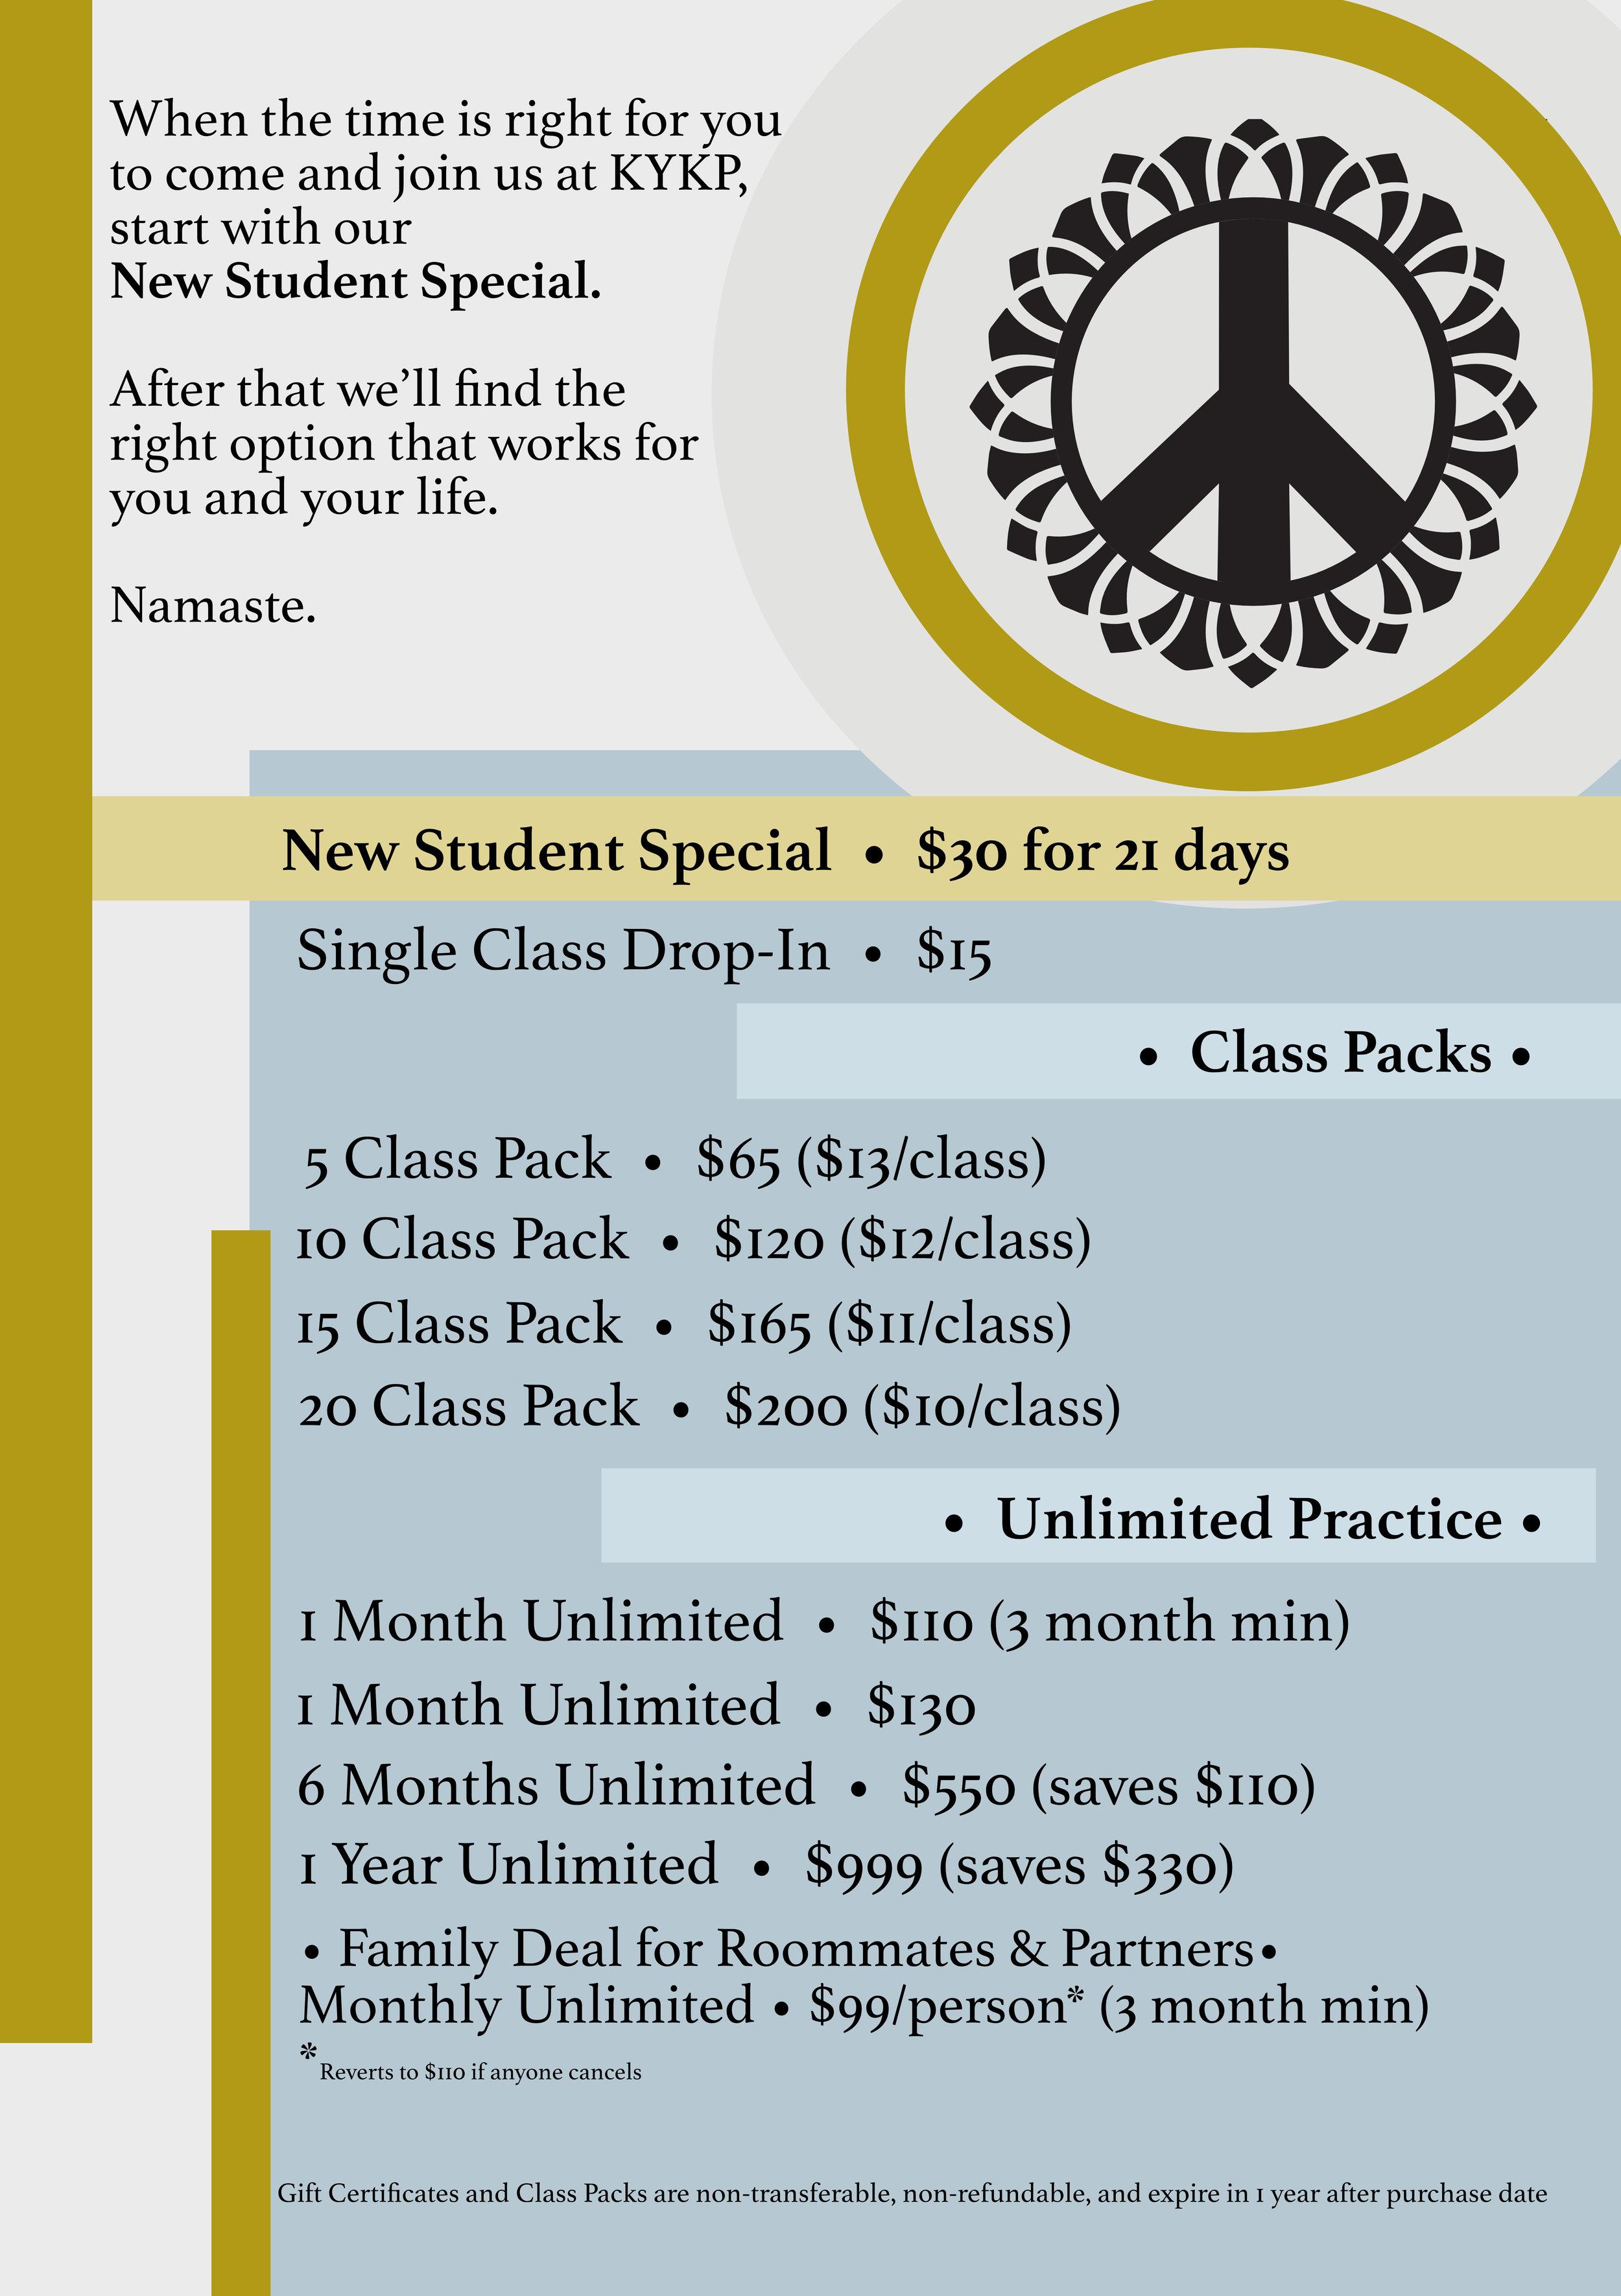 Hot Yoga Pricing Options - KYKP Yoga Studio in Bloomington, Indiana, IN- Hot Yoga - Ghosh Hatha, Bikram, Vinyasa, Meditation